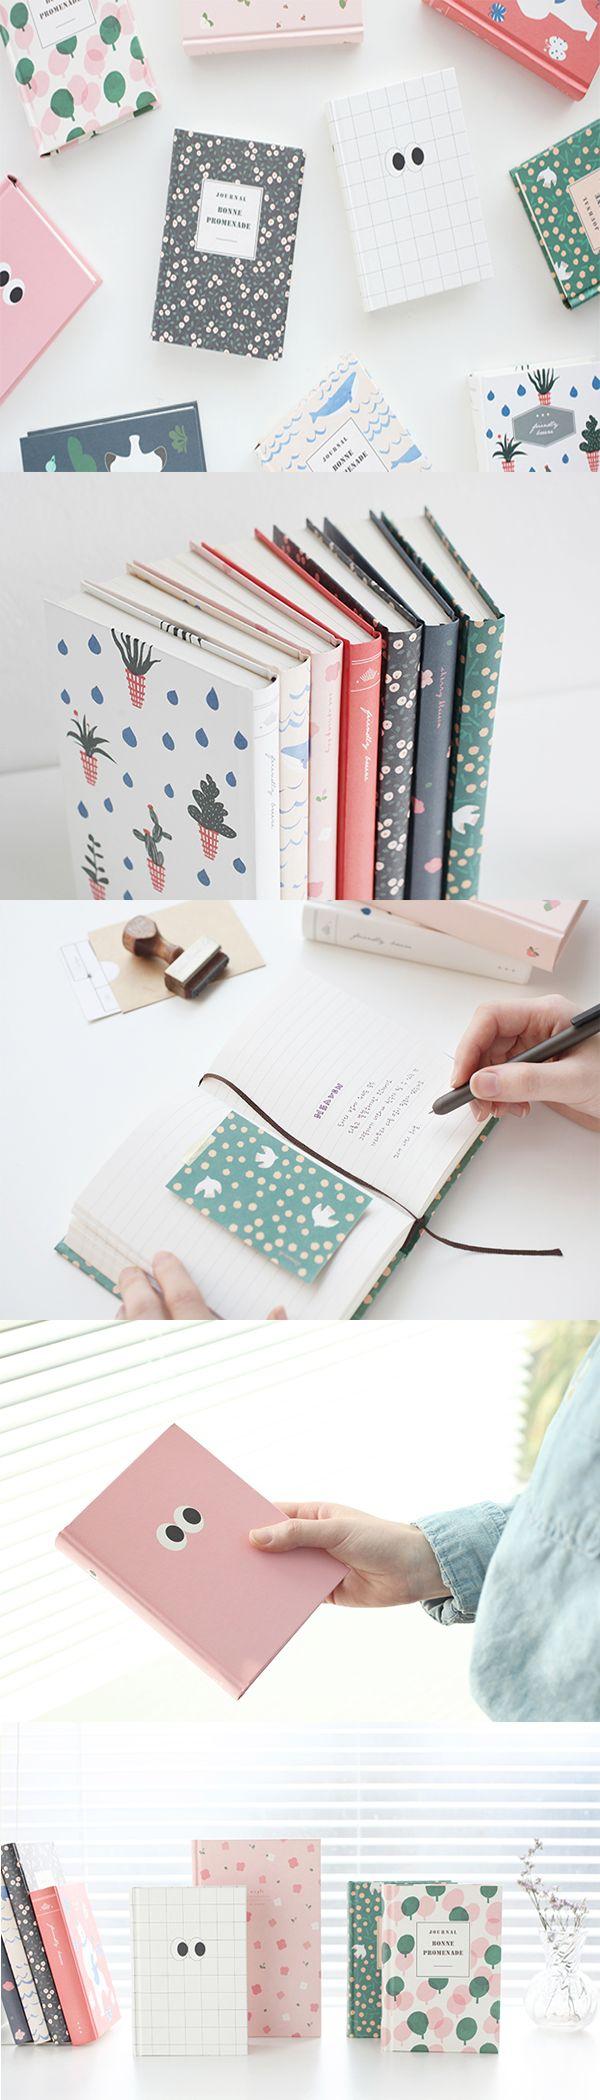 Livework Hardcover Lined Notebook